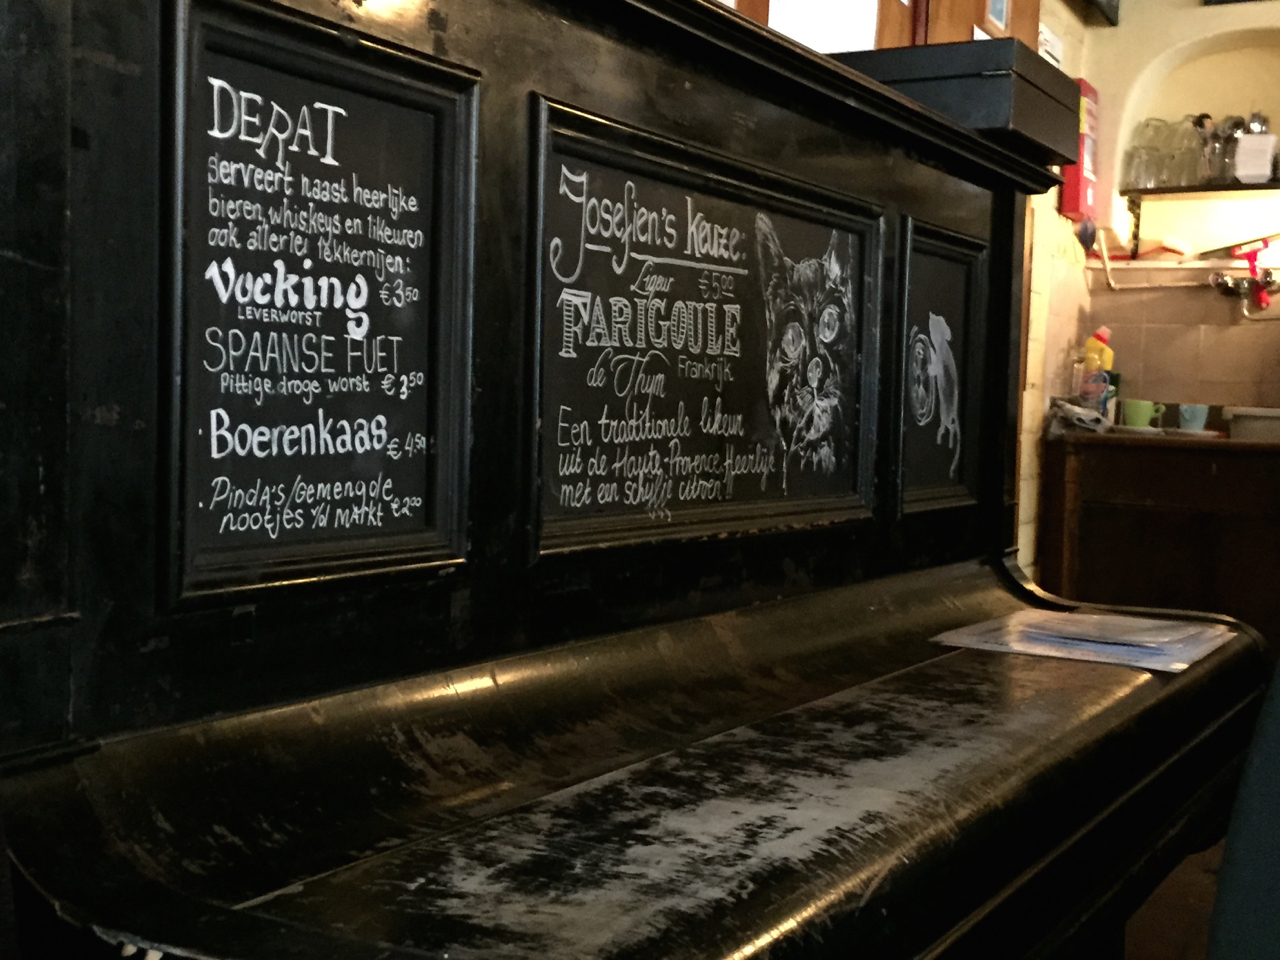 Café | Derat | Piano | bier | Utrecht